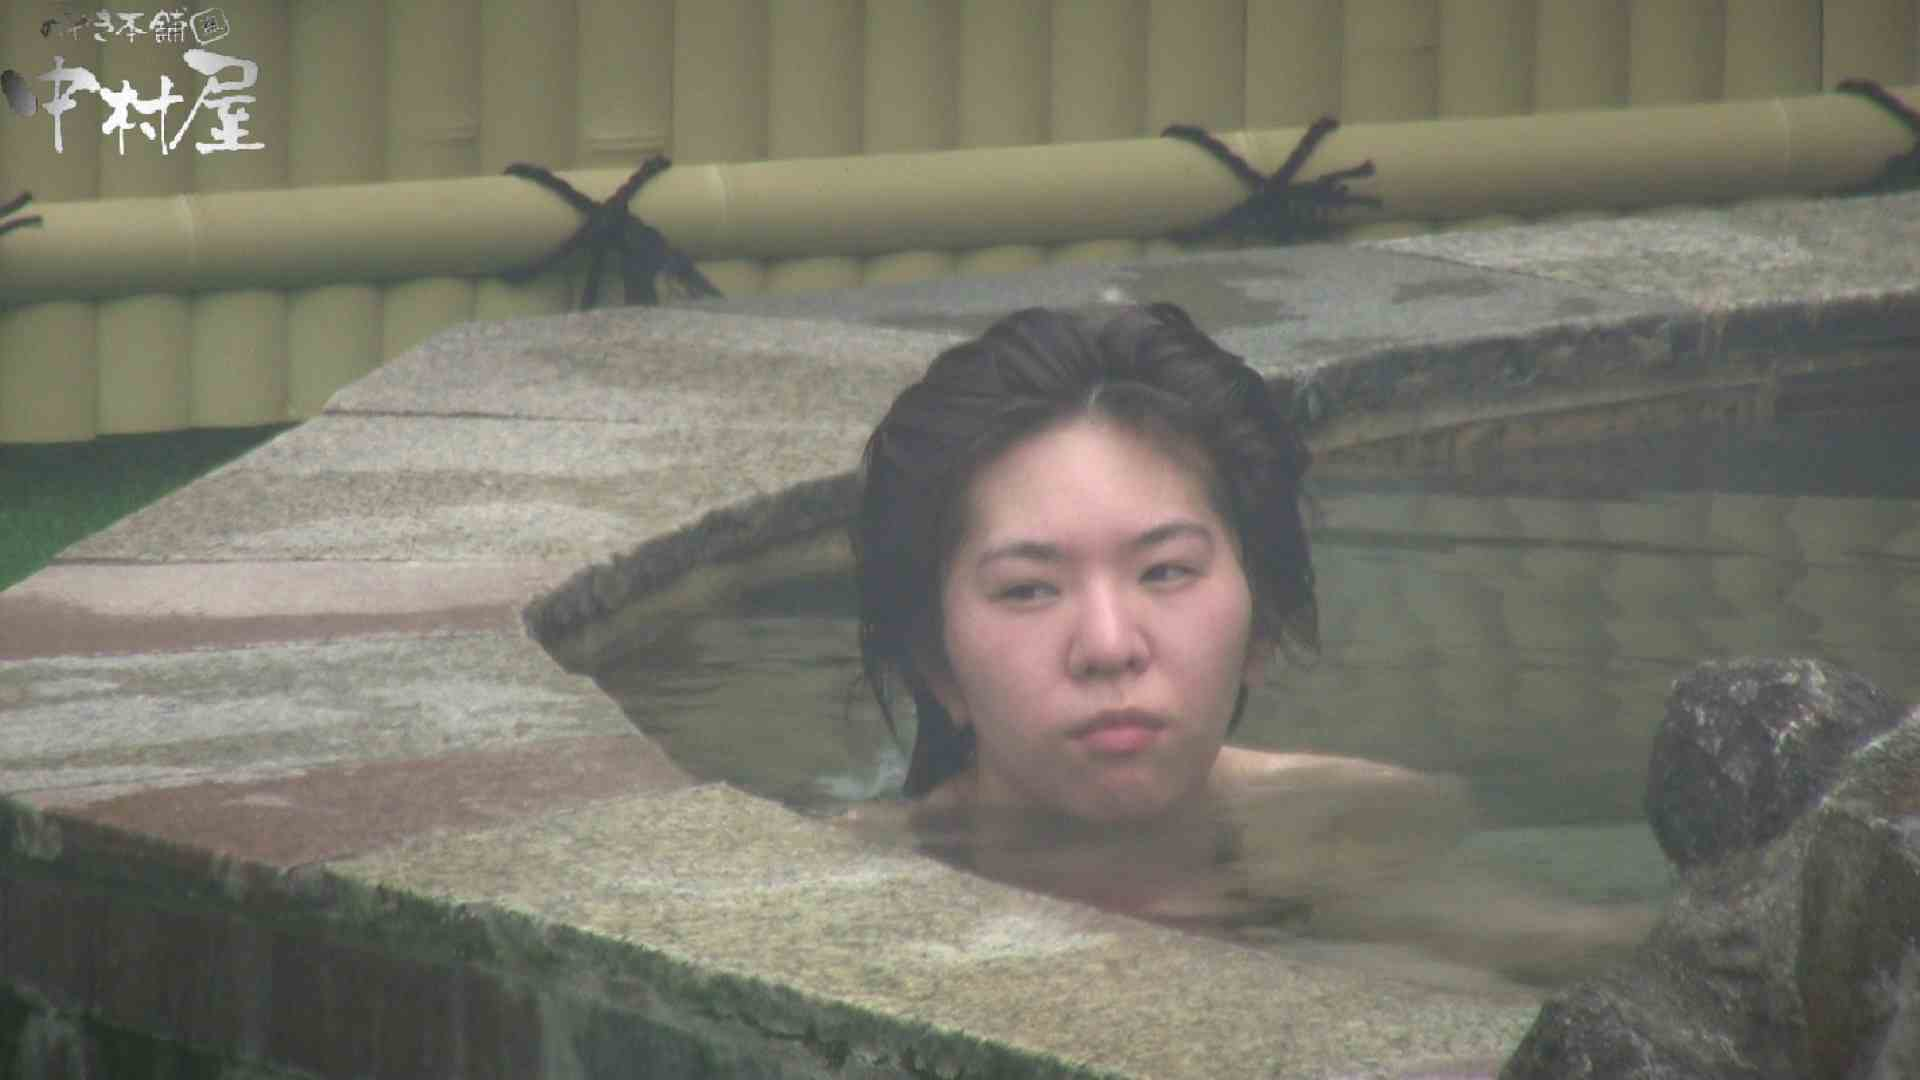 Aquaな露天風呂Vol.907 OL女体  95連発 6